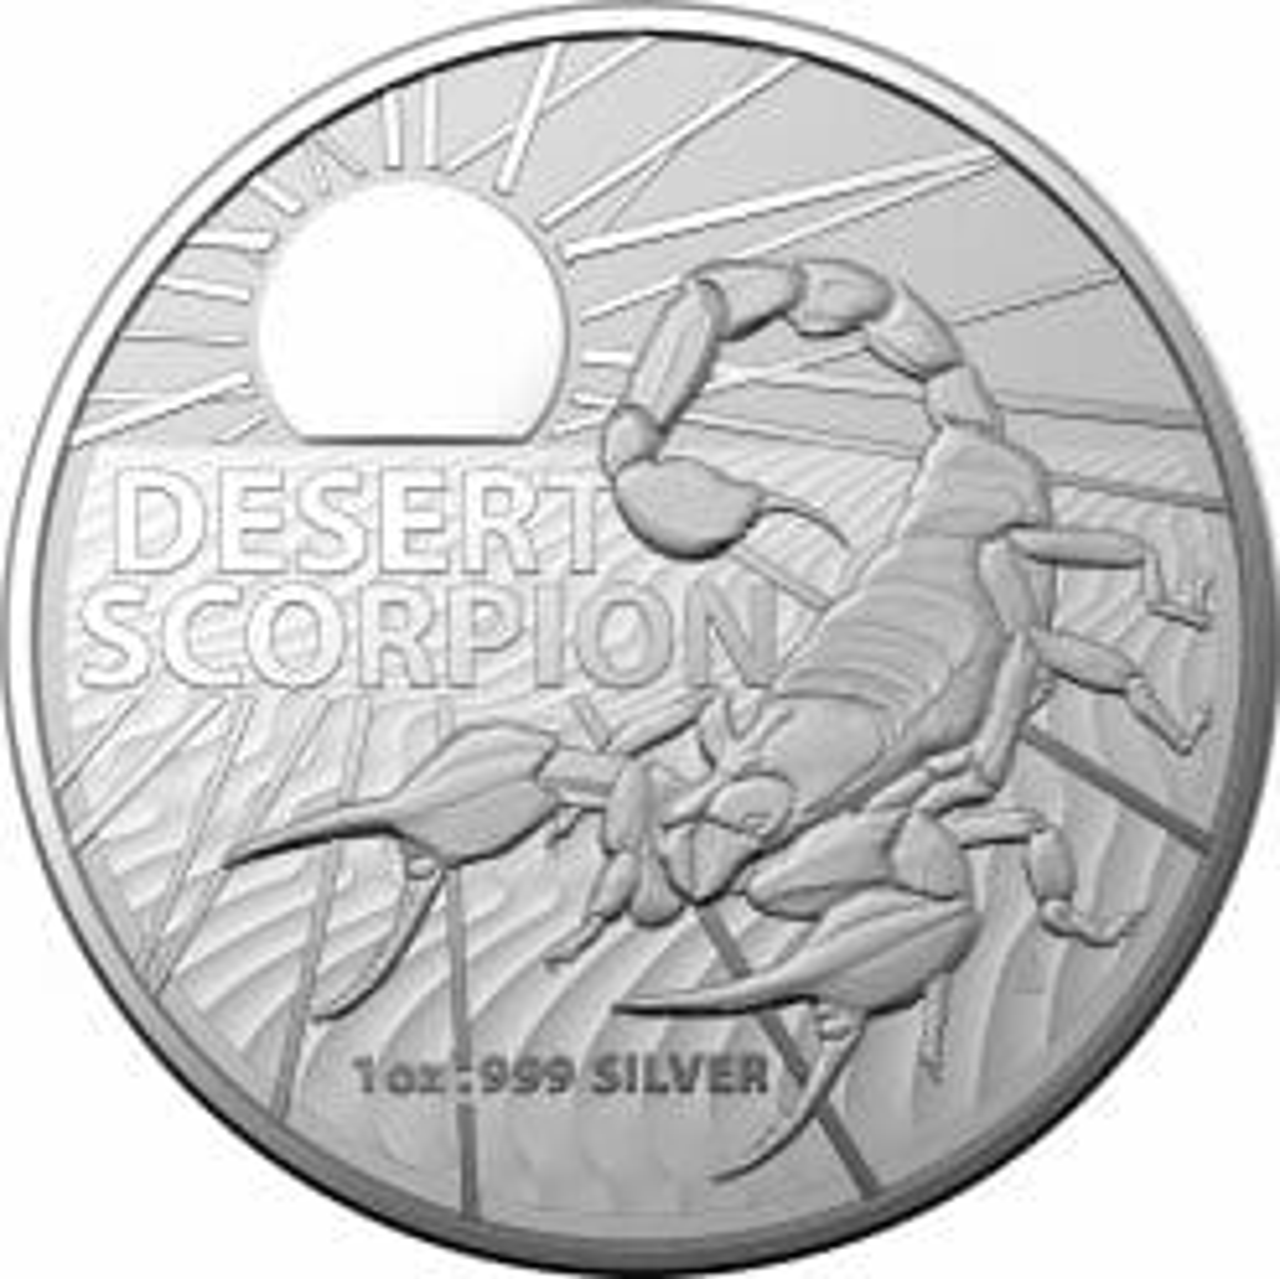 2022 Australia's Most Dangerous – Desert Scorpion 1oz .999 Silver Bullion Coin